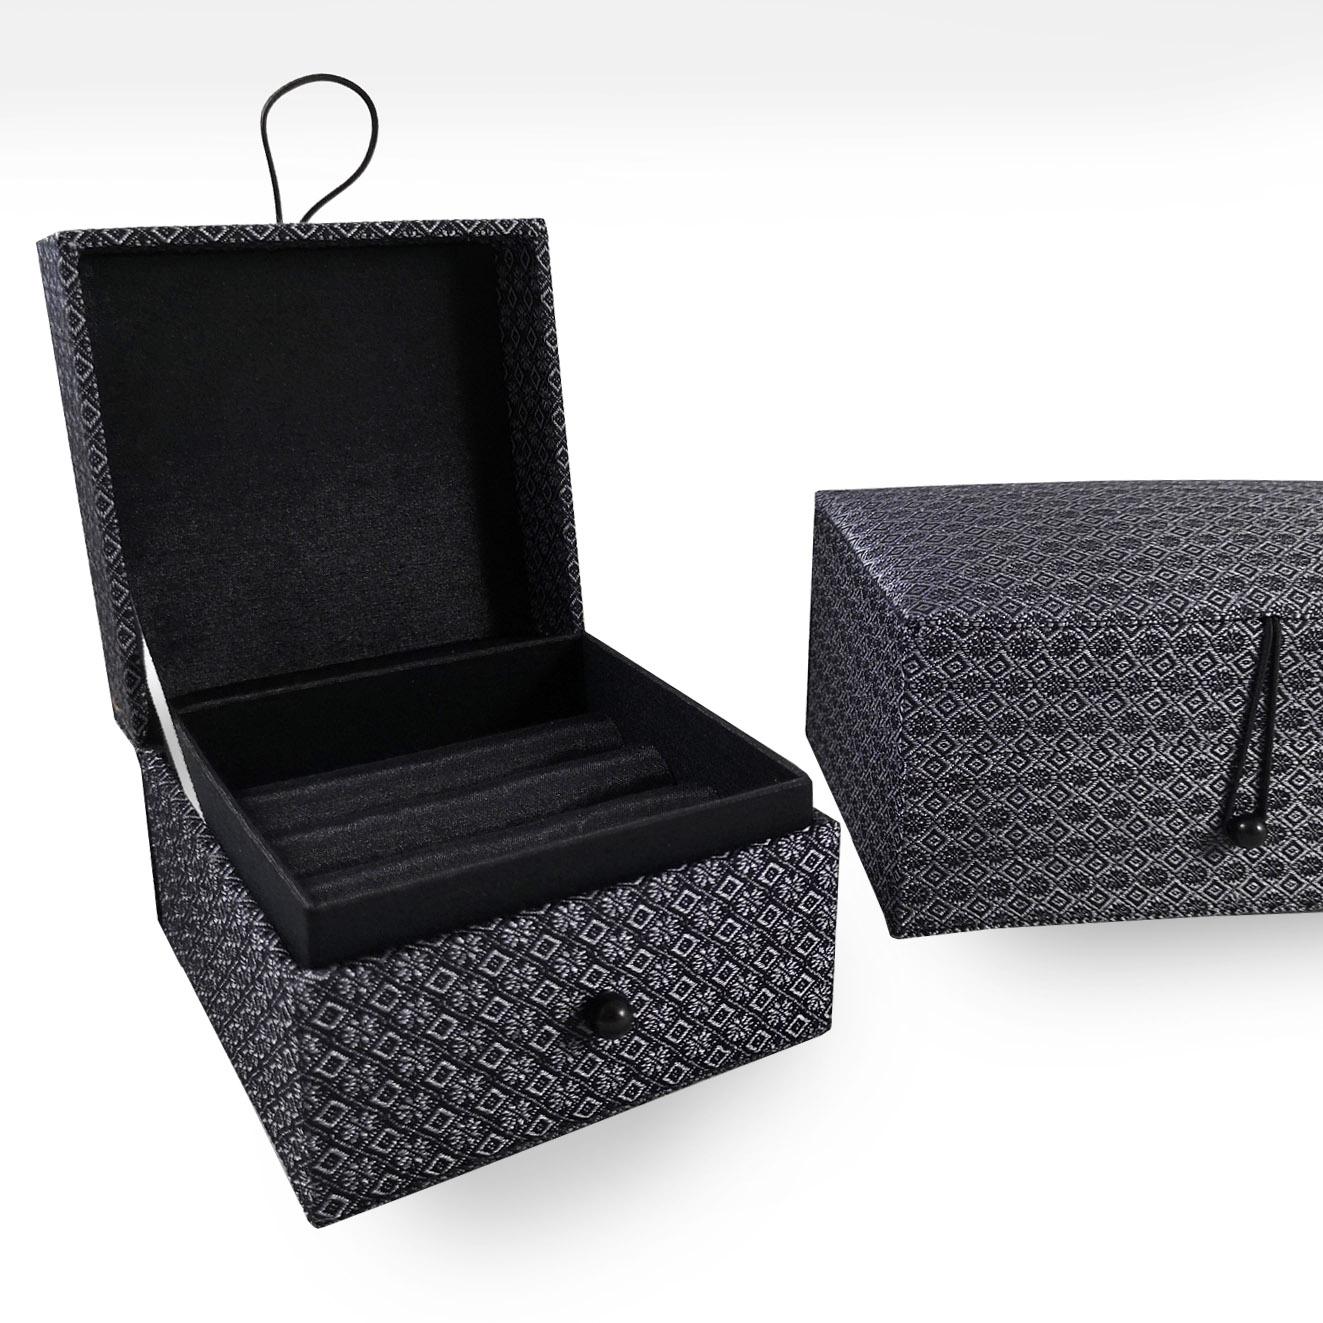 Luxury jewelry box